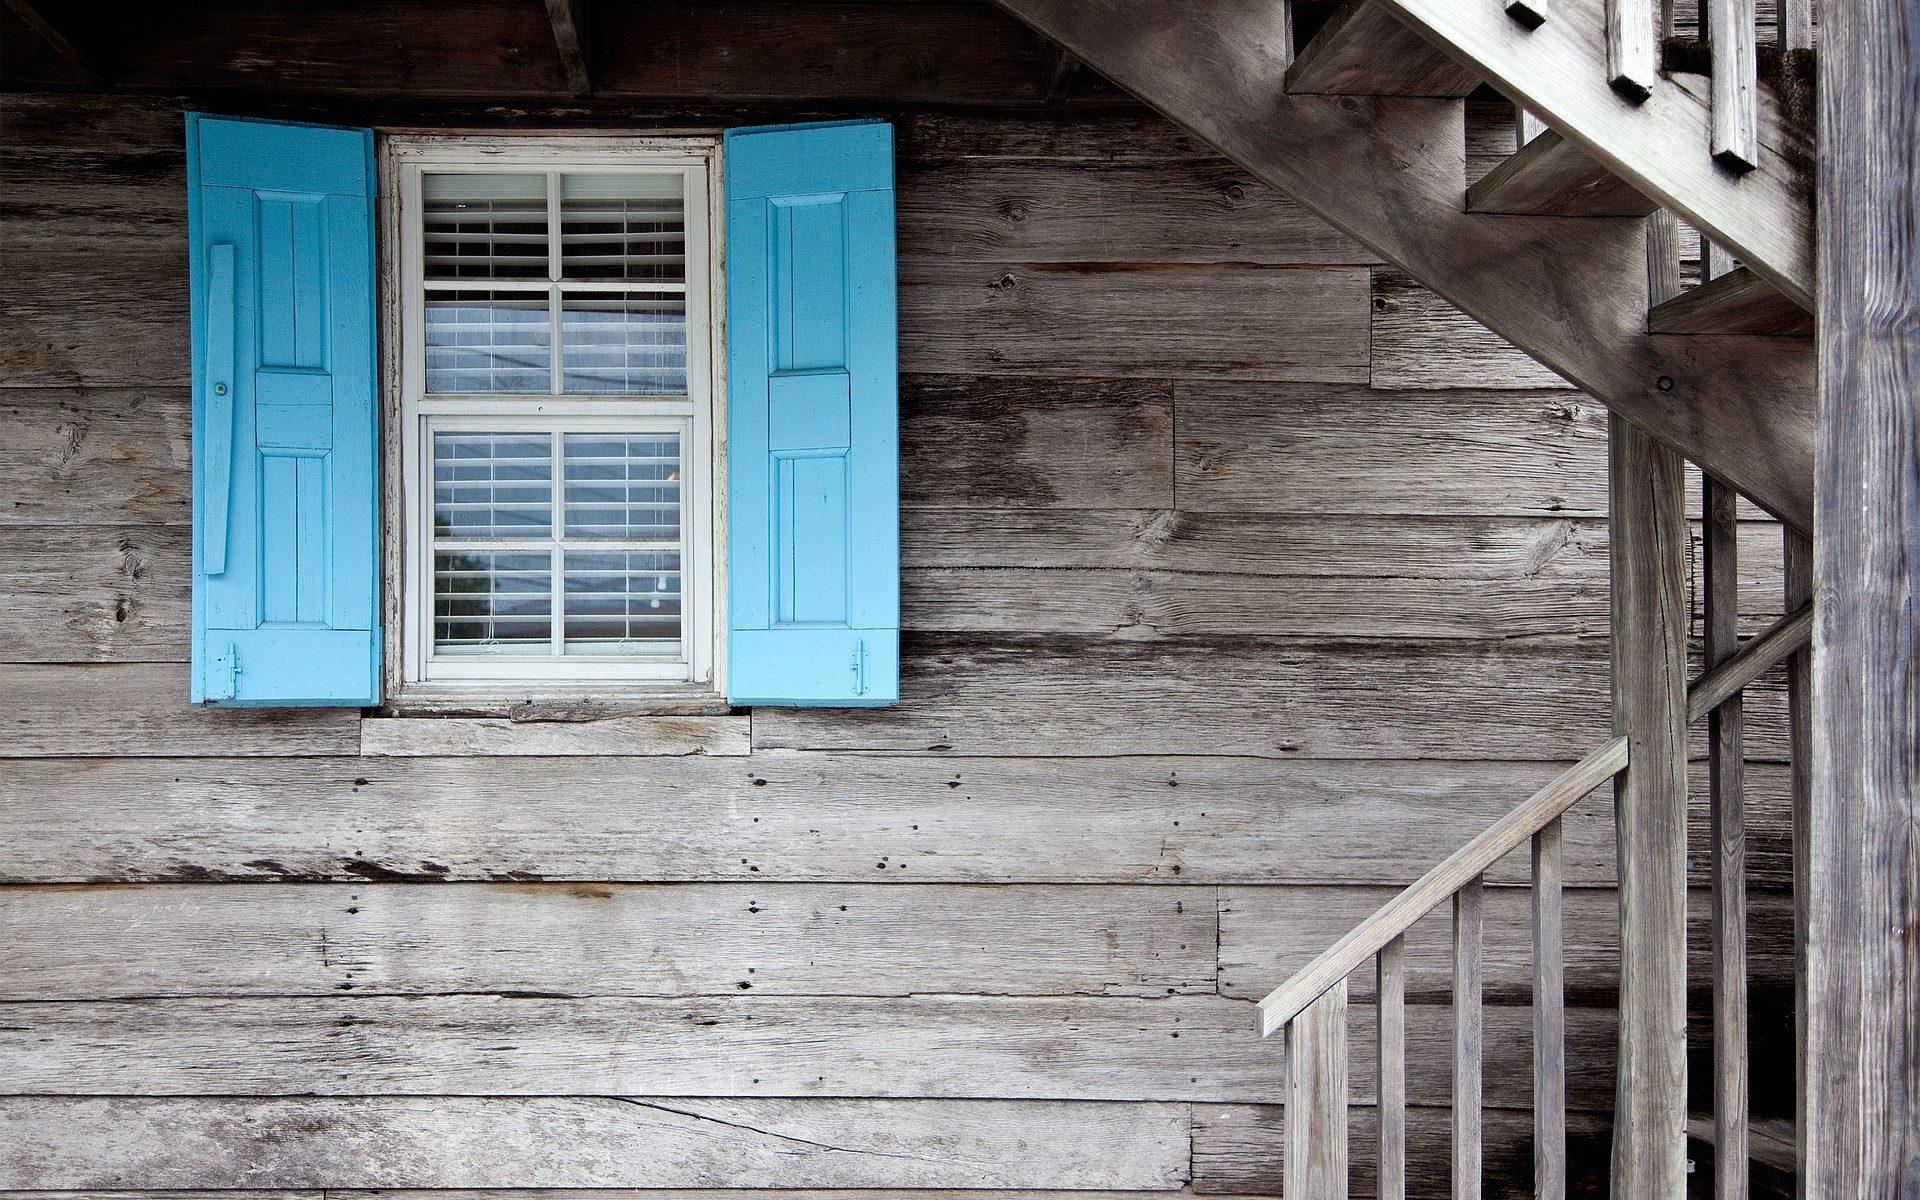 Foto Ventan azul sobre pared de madera